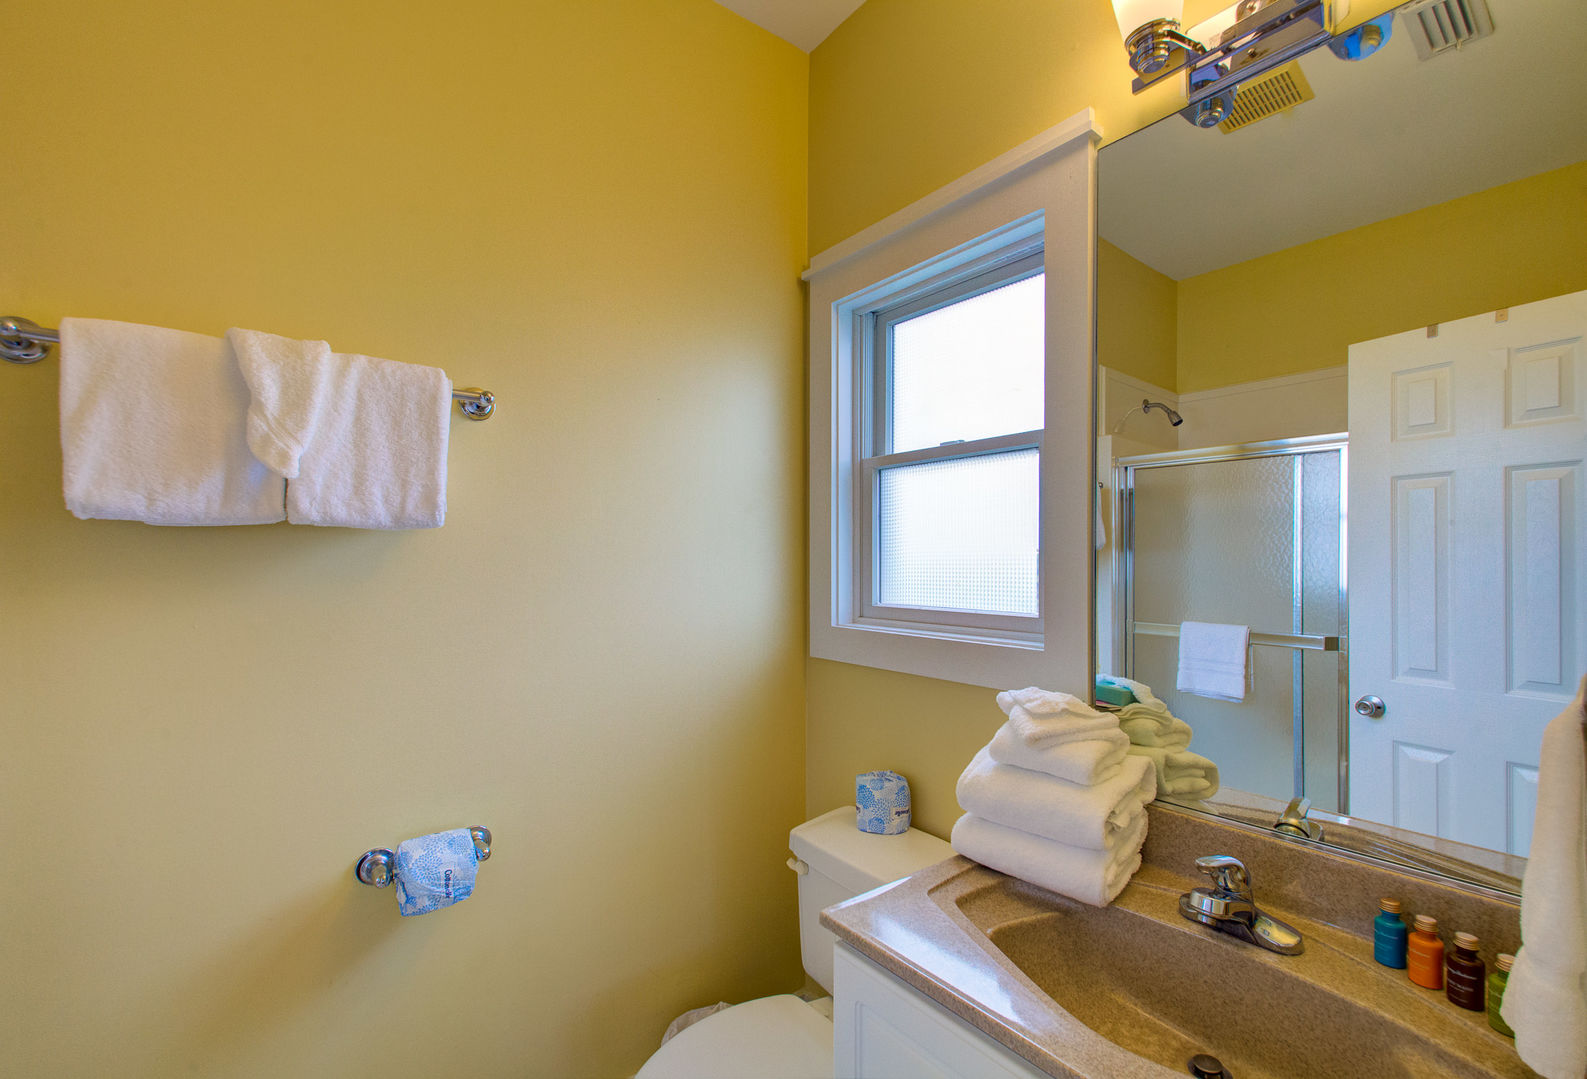 Single Vanity Sink, Mirror, Shower, and Toilet.